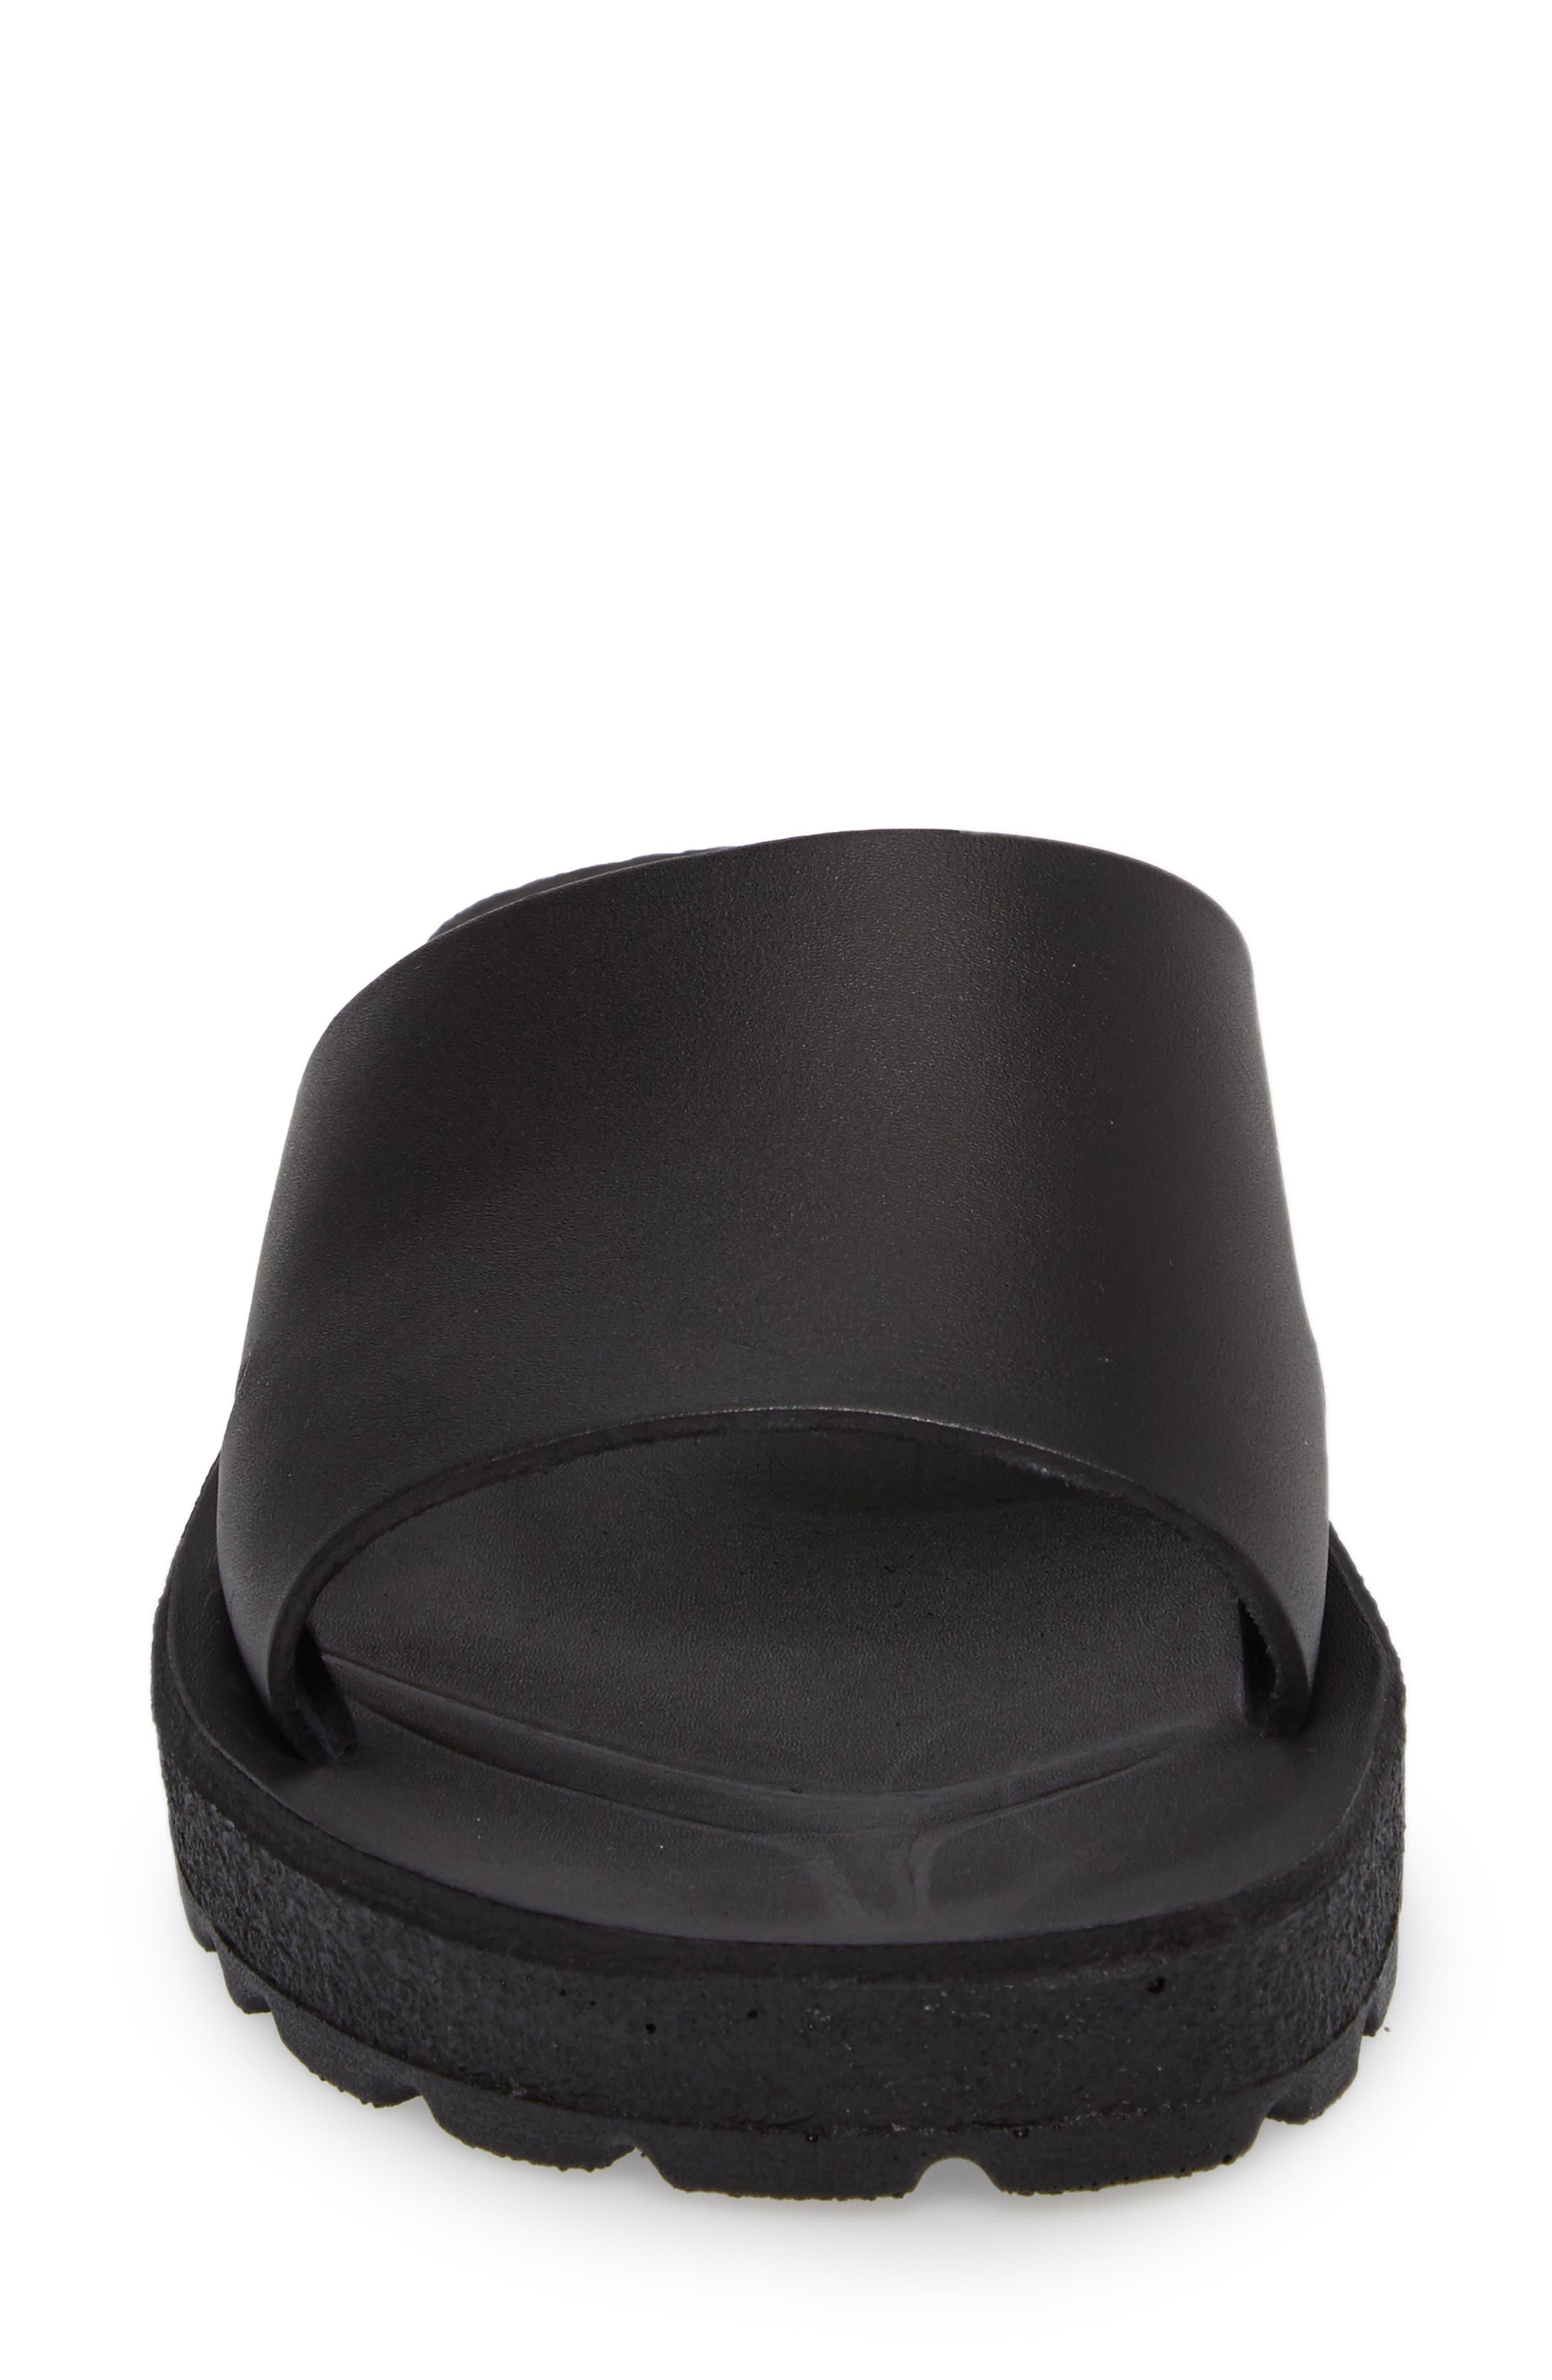 Bashn Molded Footbed Slide Sandal,                             Alternate thumbnail 4, color,                             Black Leather